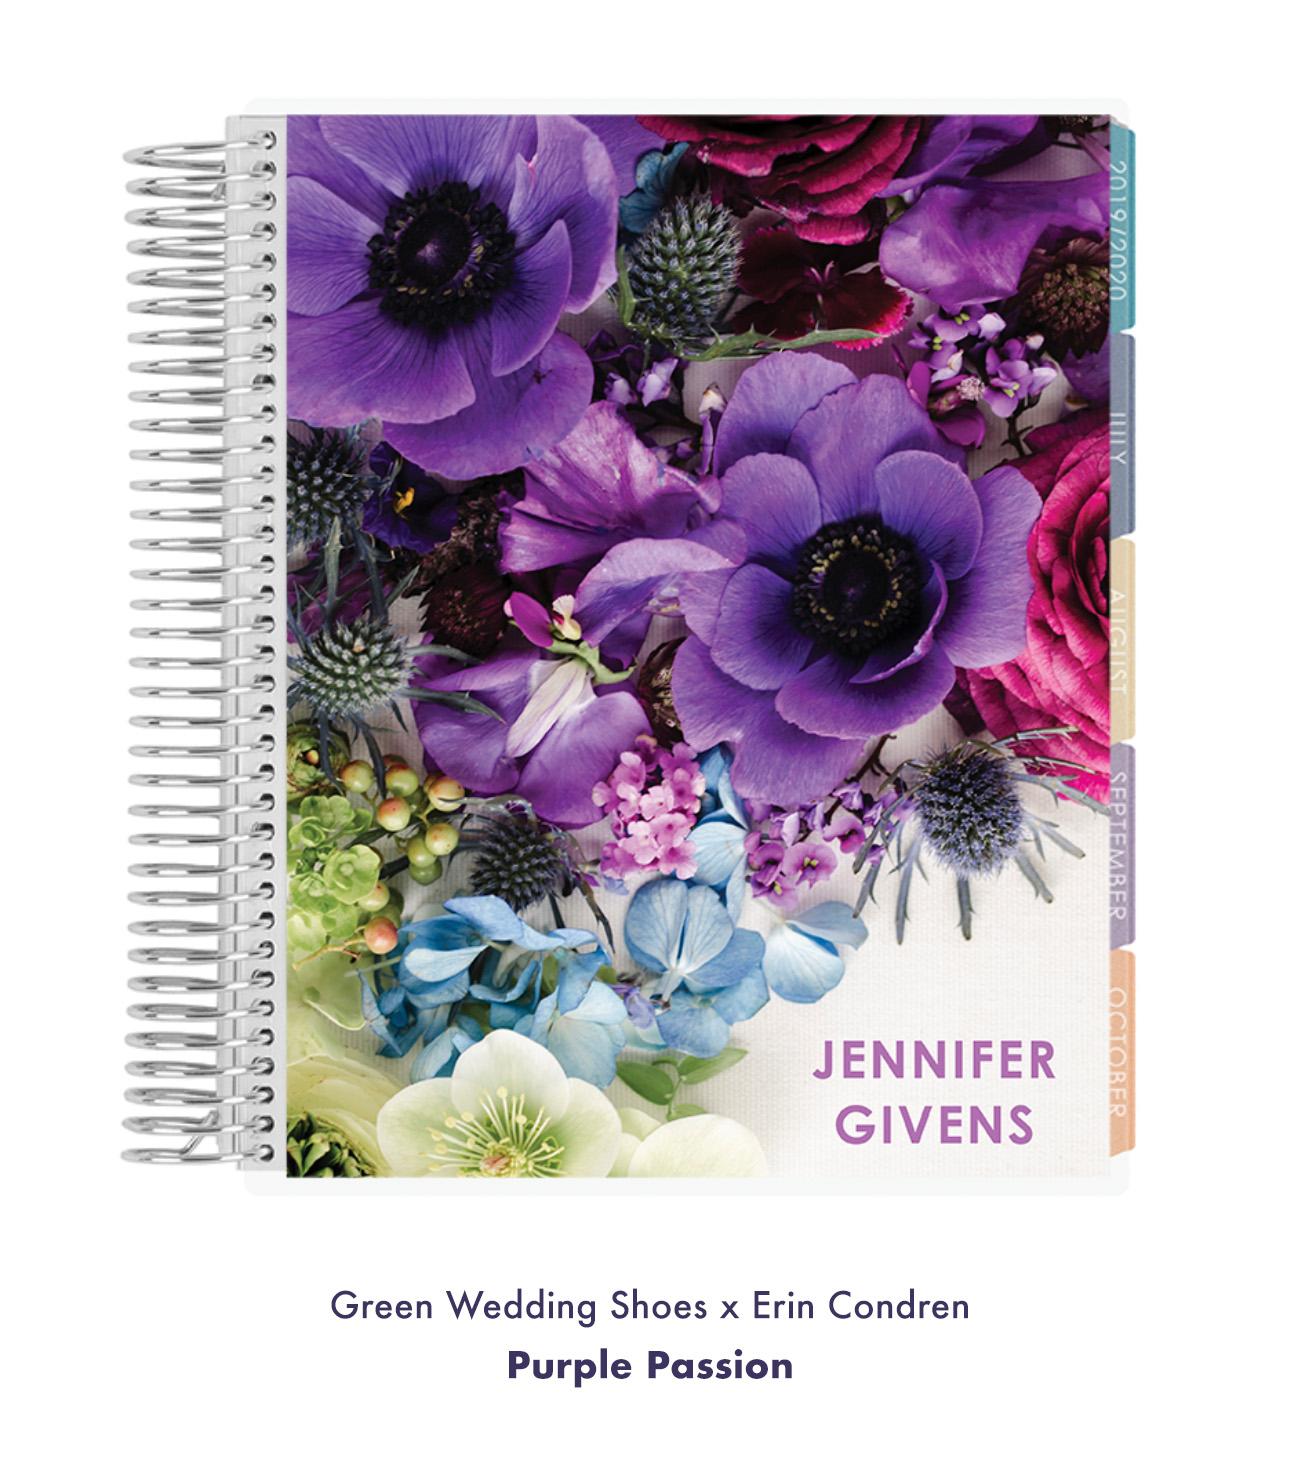 Green Wedding Shoes x Erin Condren Purple Passion Design